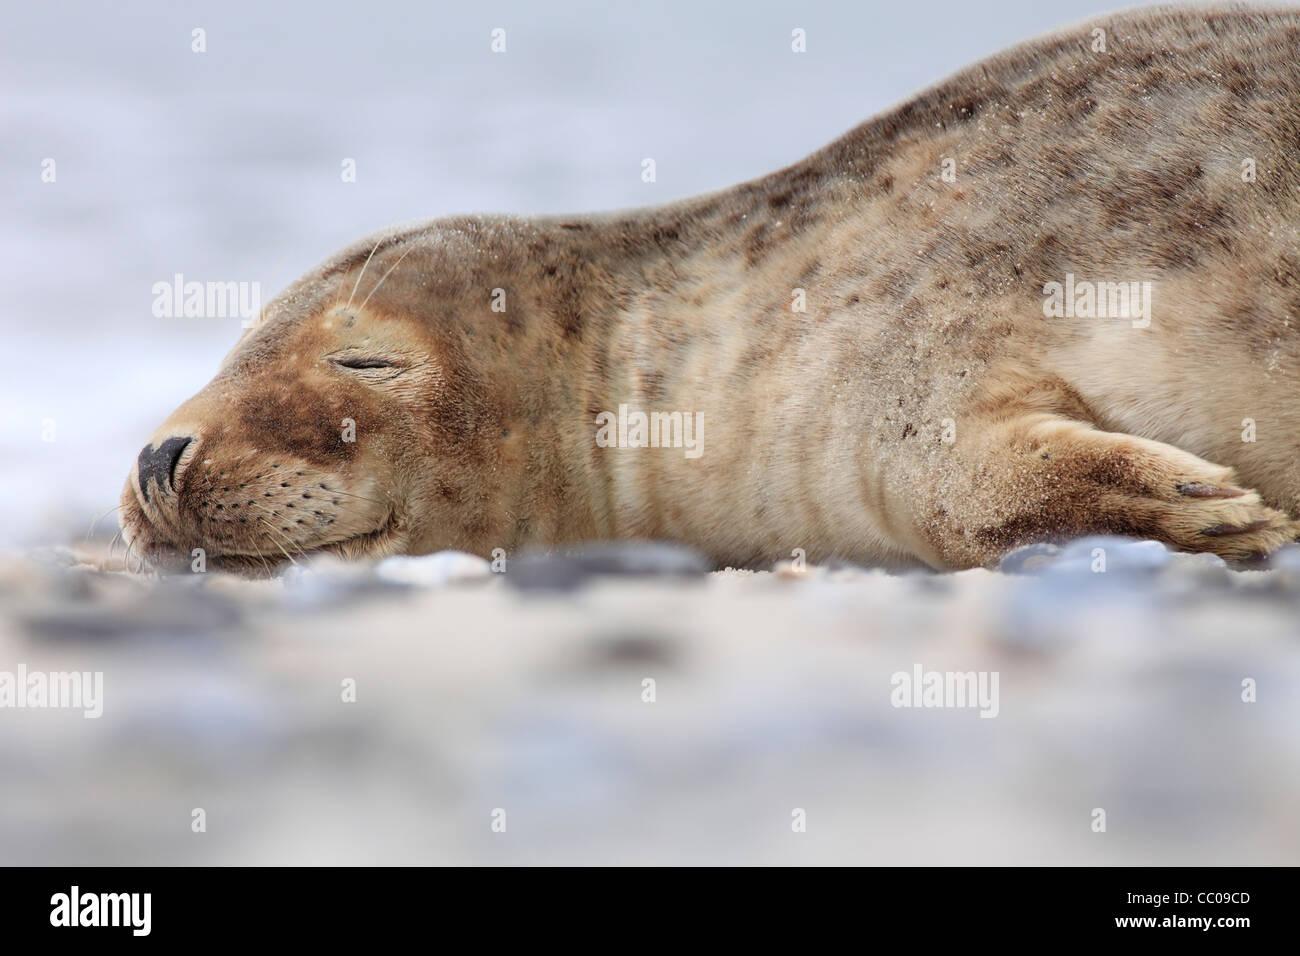 sleeping young grey seal; Latin: Halichoerus grypus - Stock Image